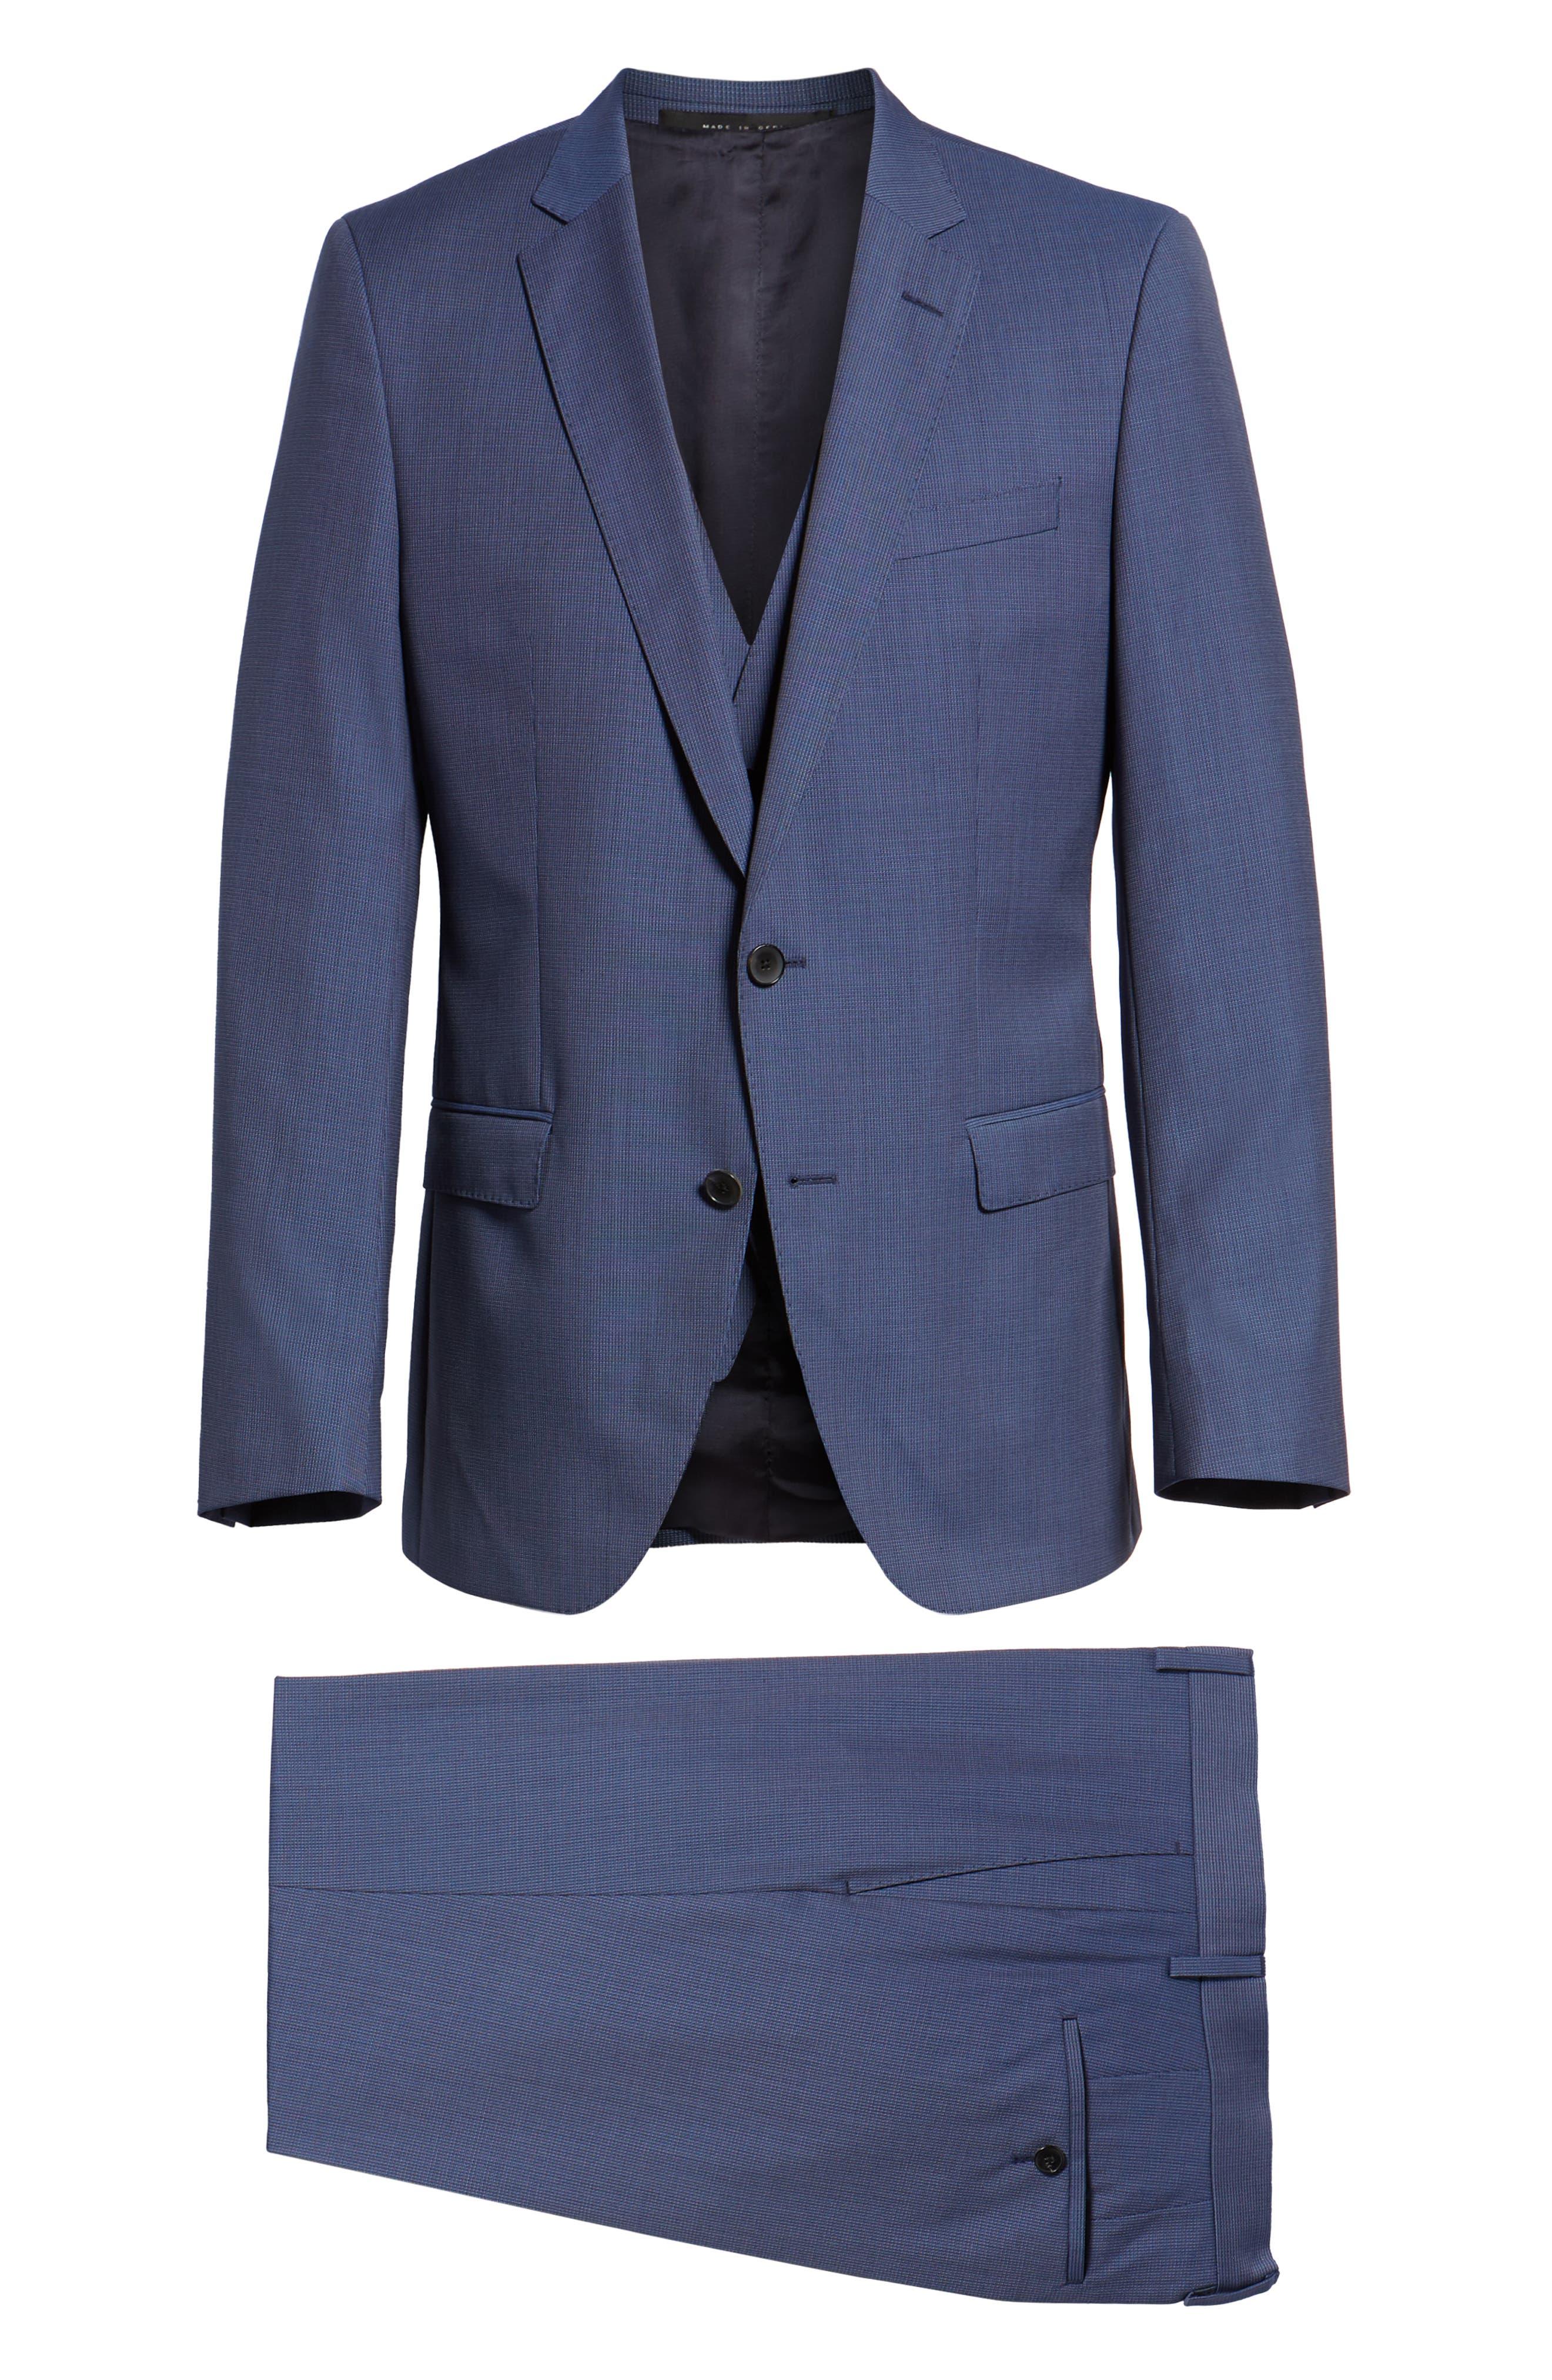 Huge/Genius Trim Fit Solid Three Piece Wool Suit,                             Alternate thumbnail 10, color,                             BLUE